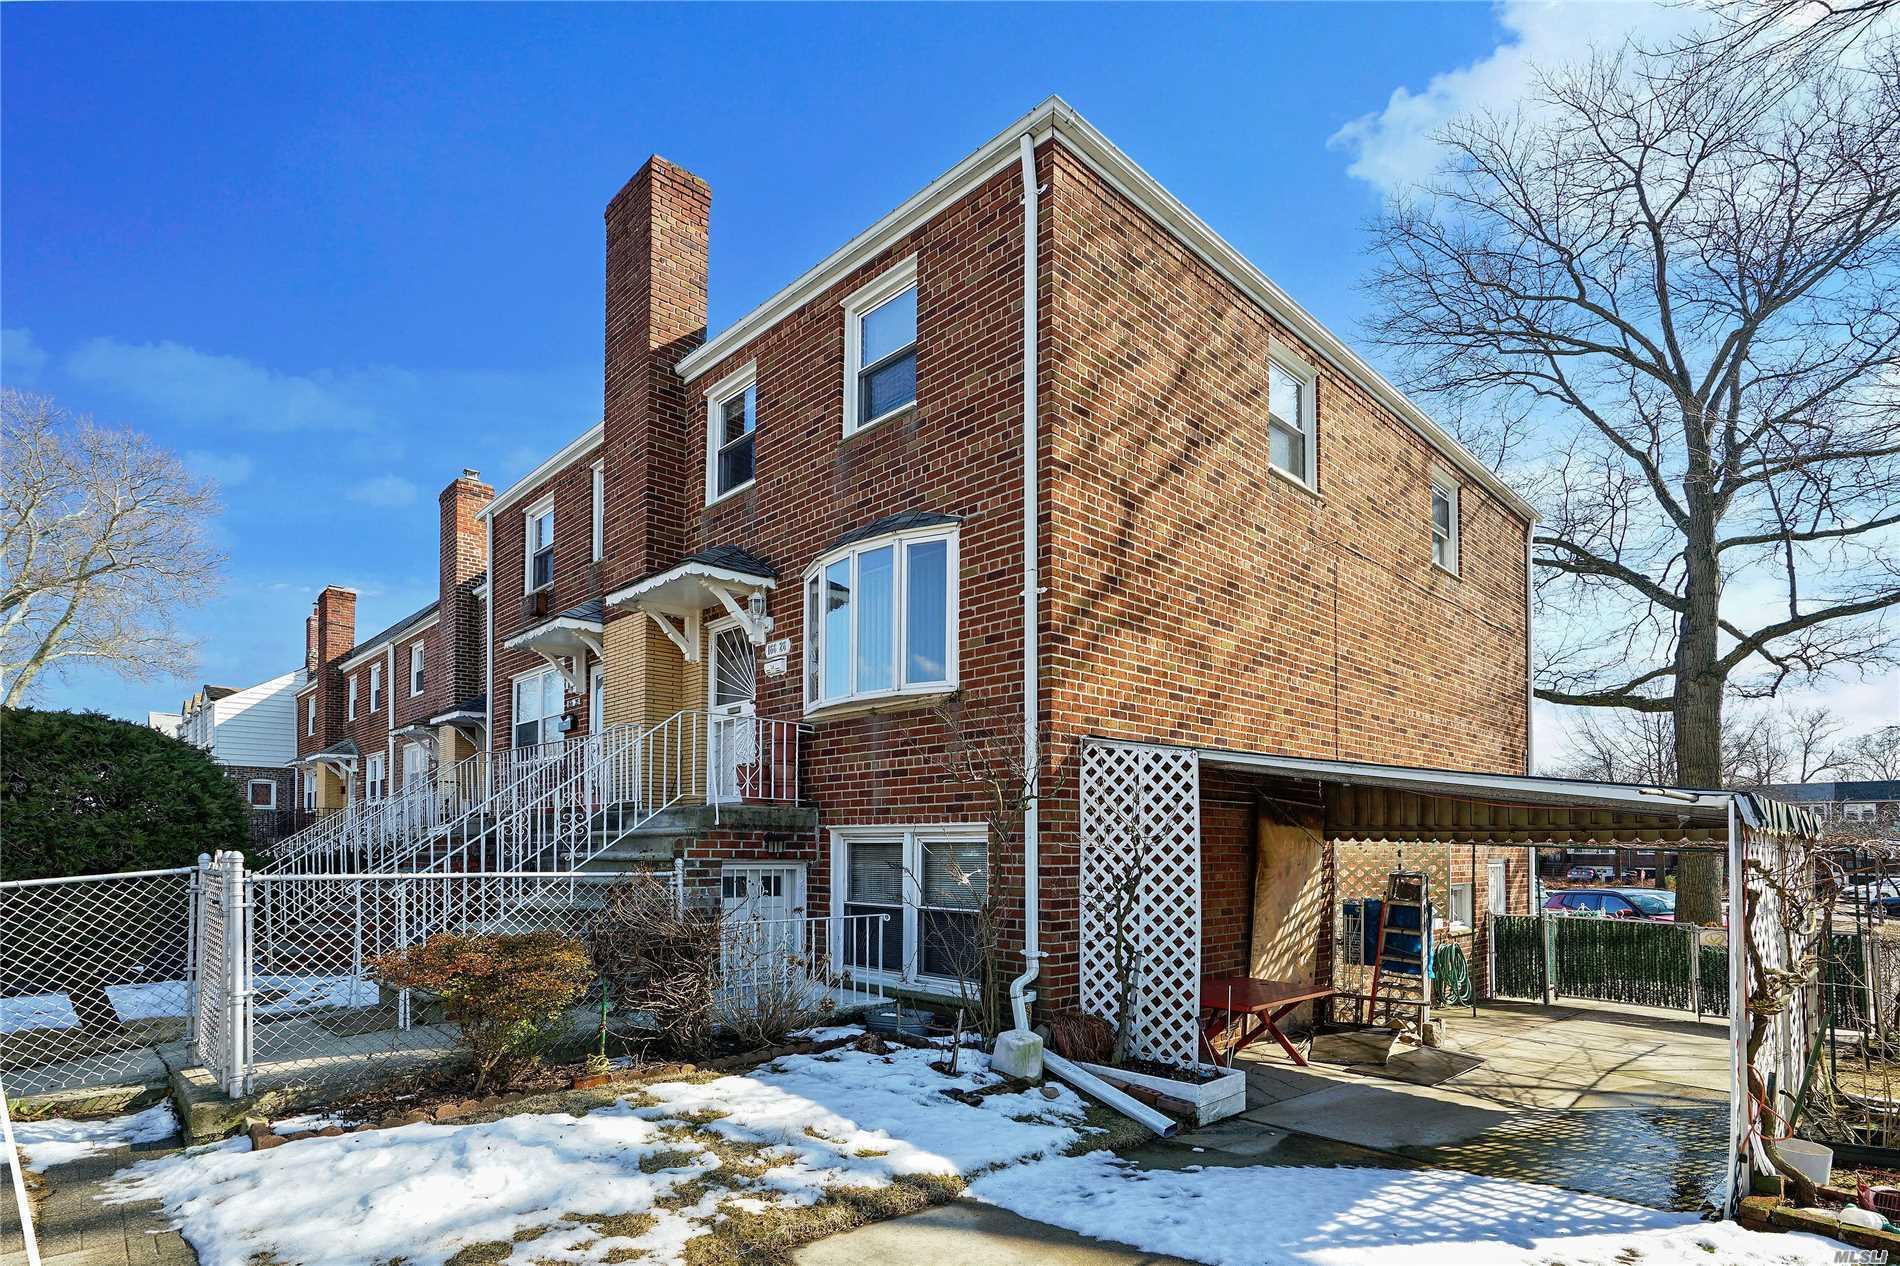 Property for sale at 166-26 25th Avenue, Whitestone NY 11357, Whitestone,  New York 11357